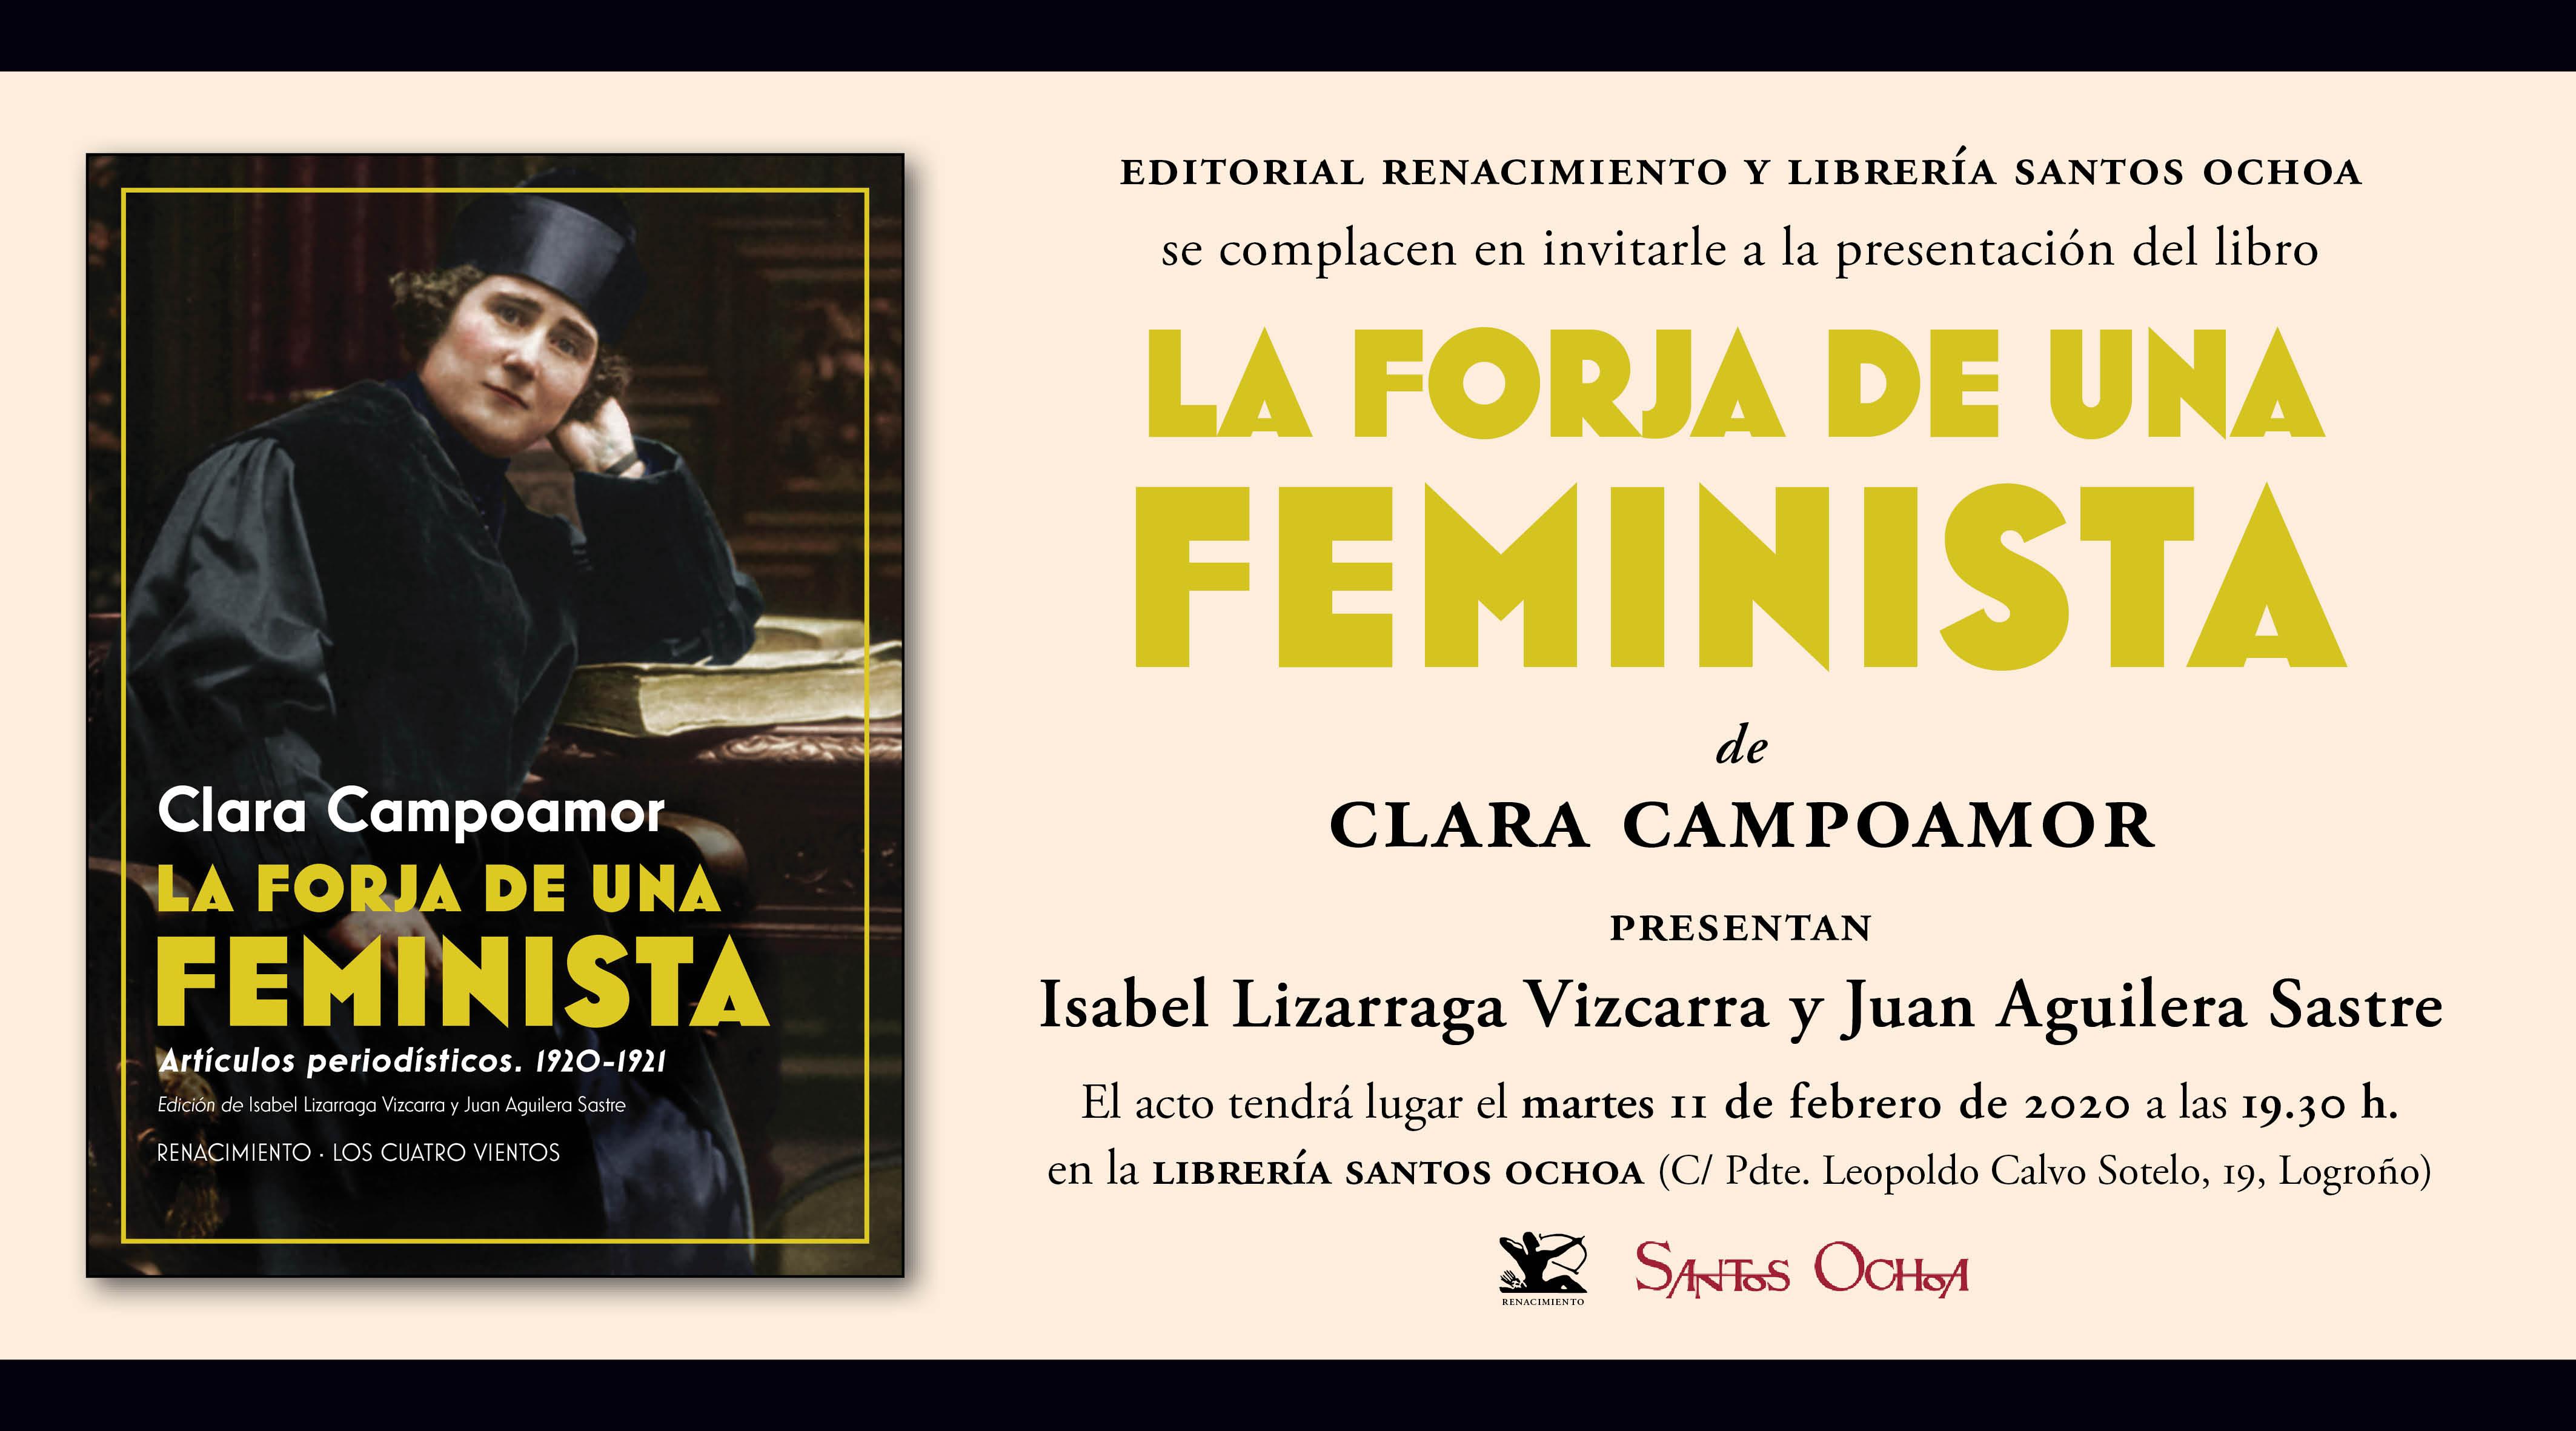 Invitacion_LA_FORJA_DE_UNA_FEMINISTA_LOGRONO